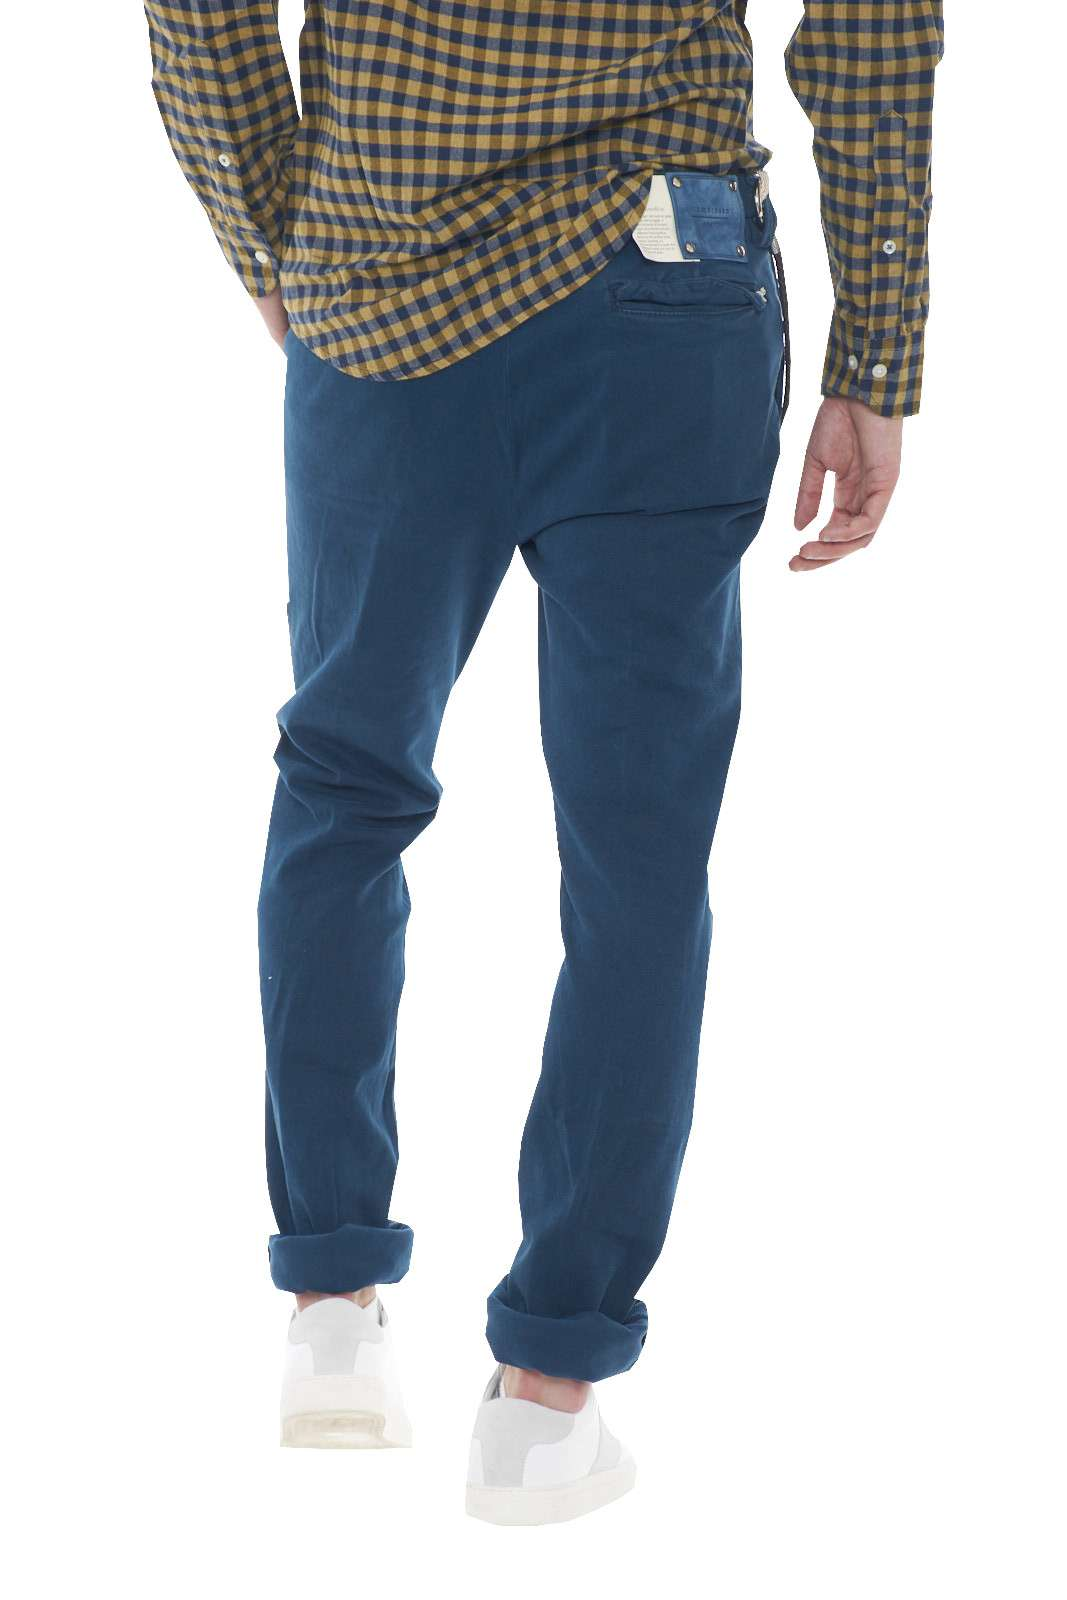 https://www.parmax.com/media/catalog/product/a/i/AI-outlet_parmax-pantaloni-uomo-Tramarossa-ROBERT-C.jpg